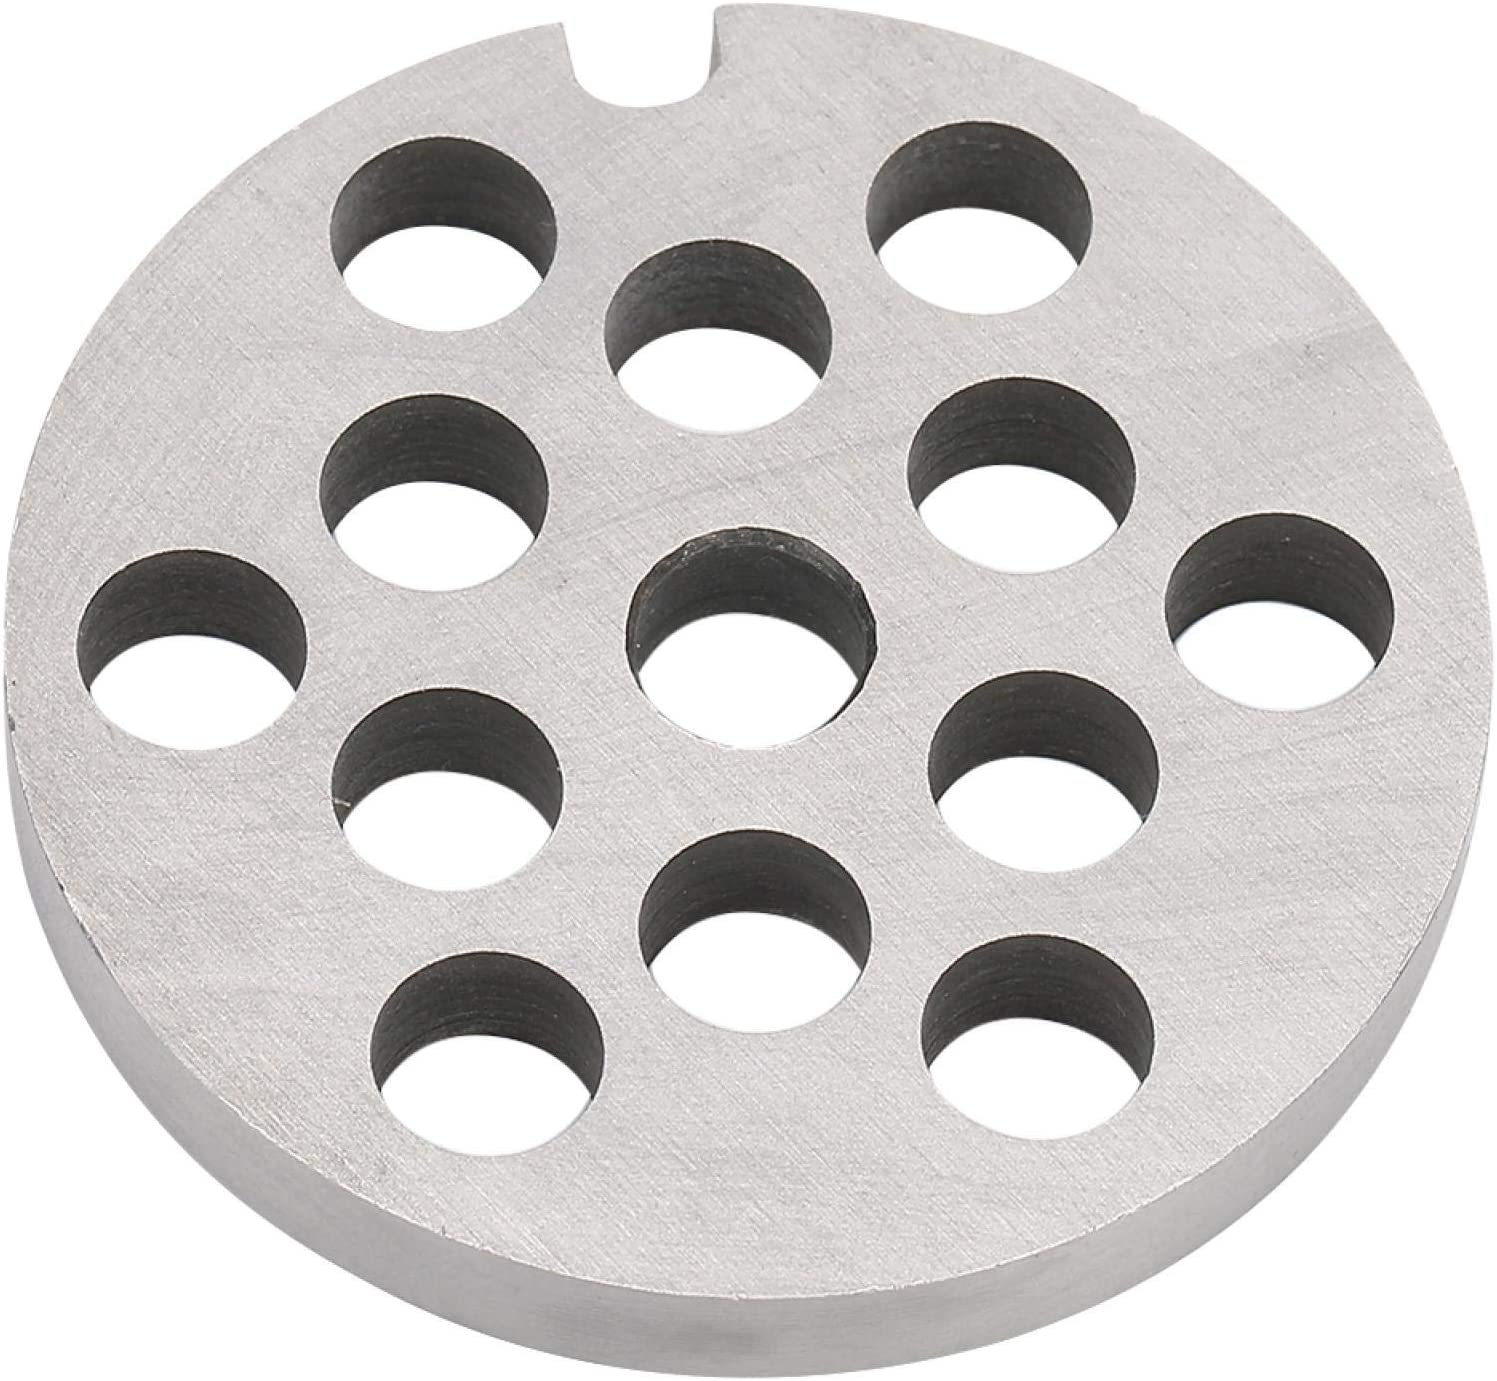 Placa de picadora de carne de 5 cm, hoja de picadora de acero inoxidable plateado, cuchillo de disco de cocina para carne, frutas o verduras caseras (8 mm)